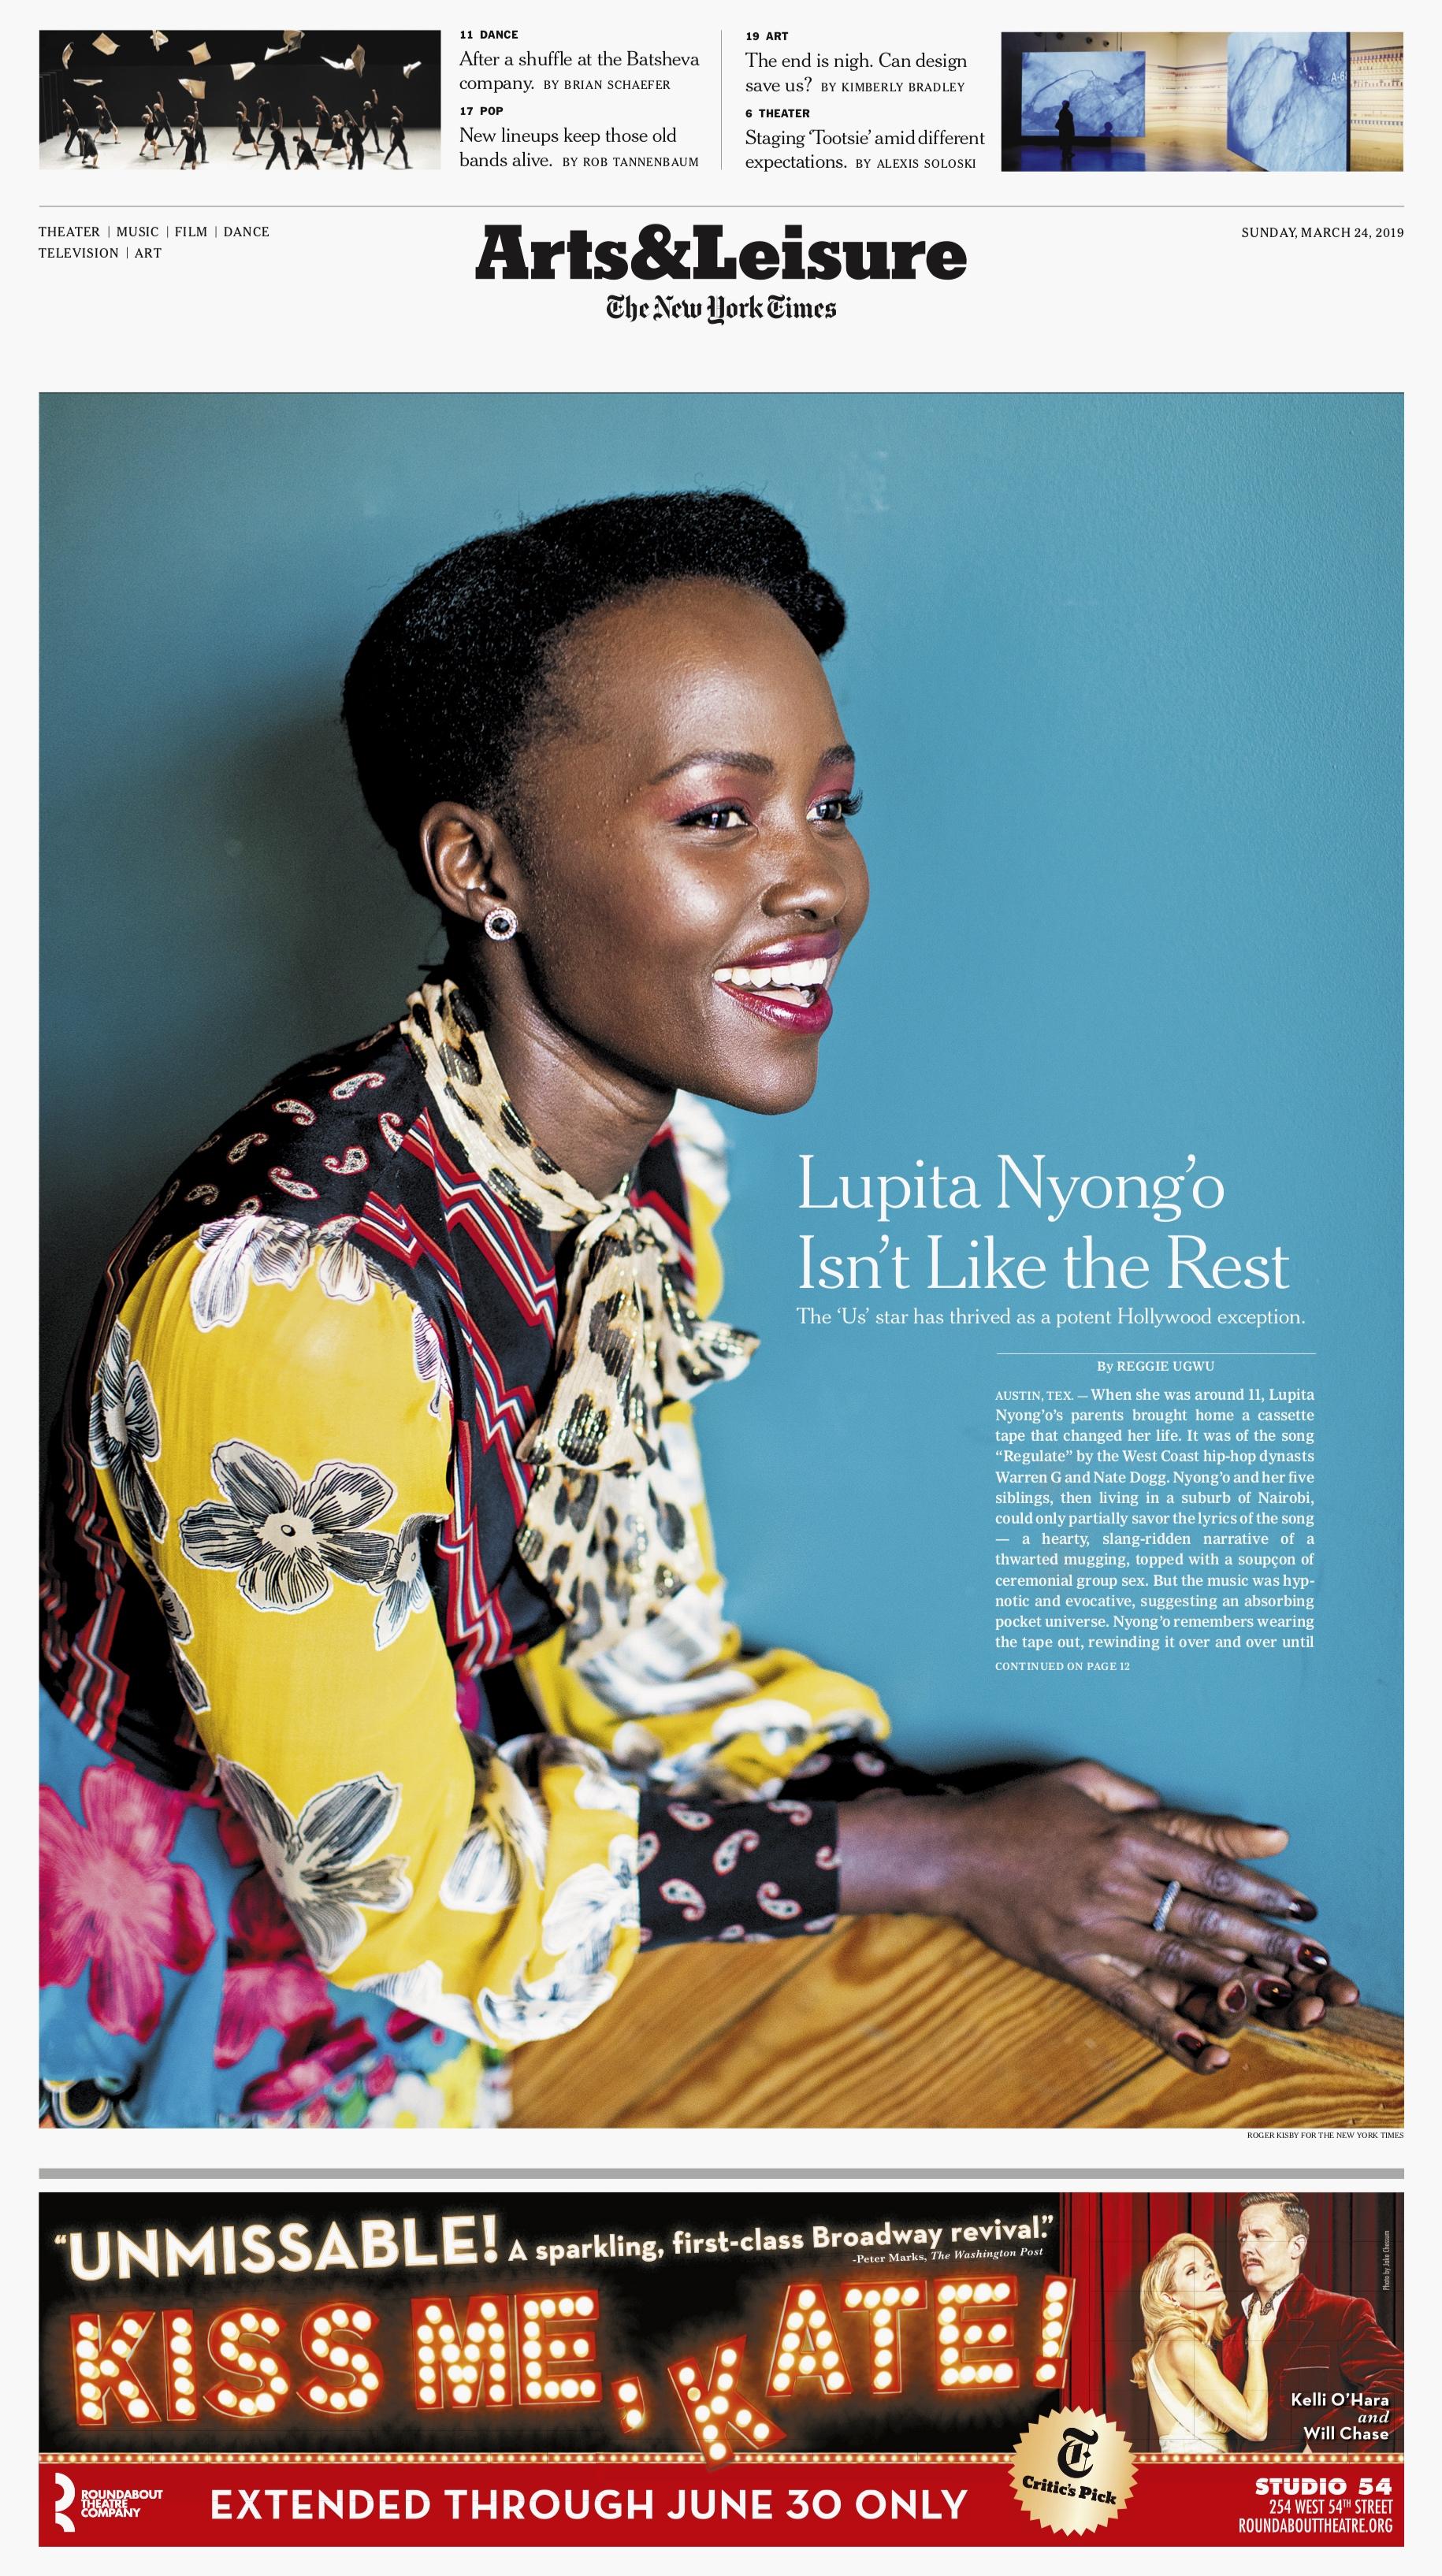 Lupita Nyong'o for New York Times